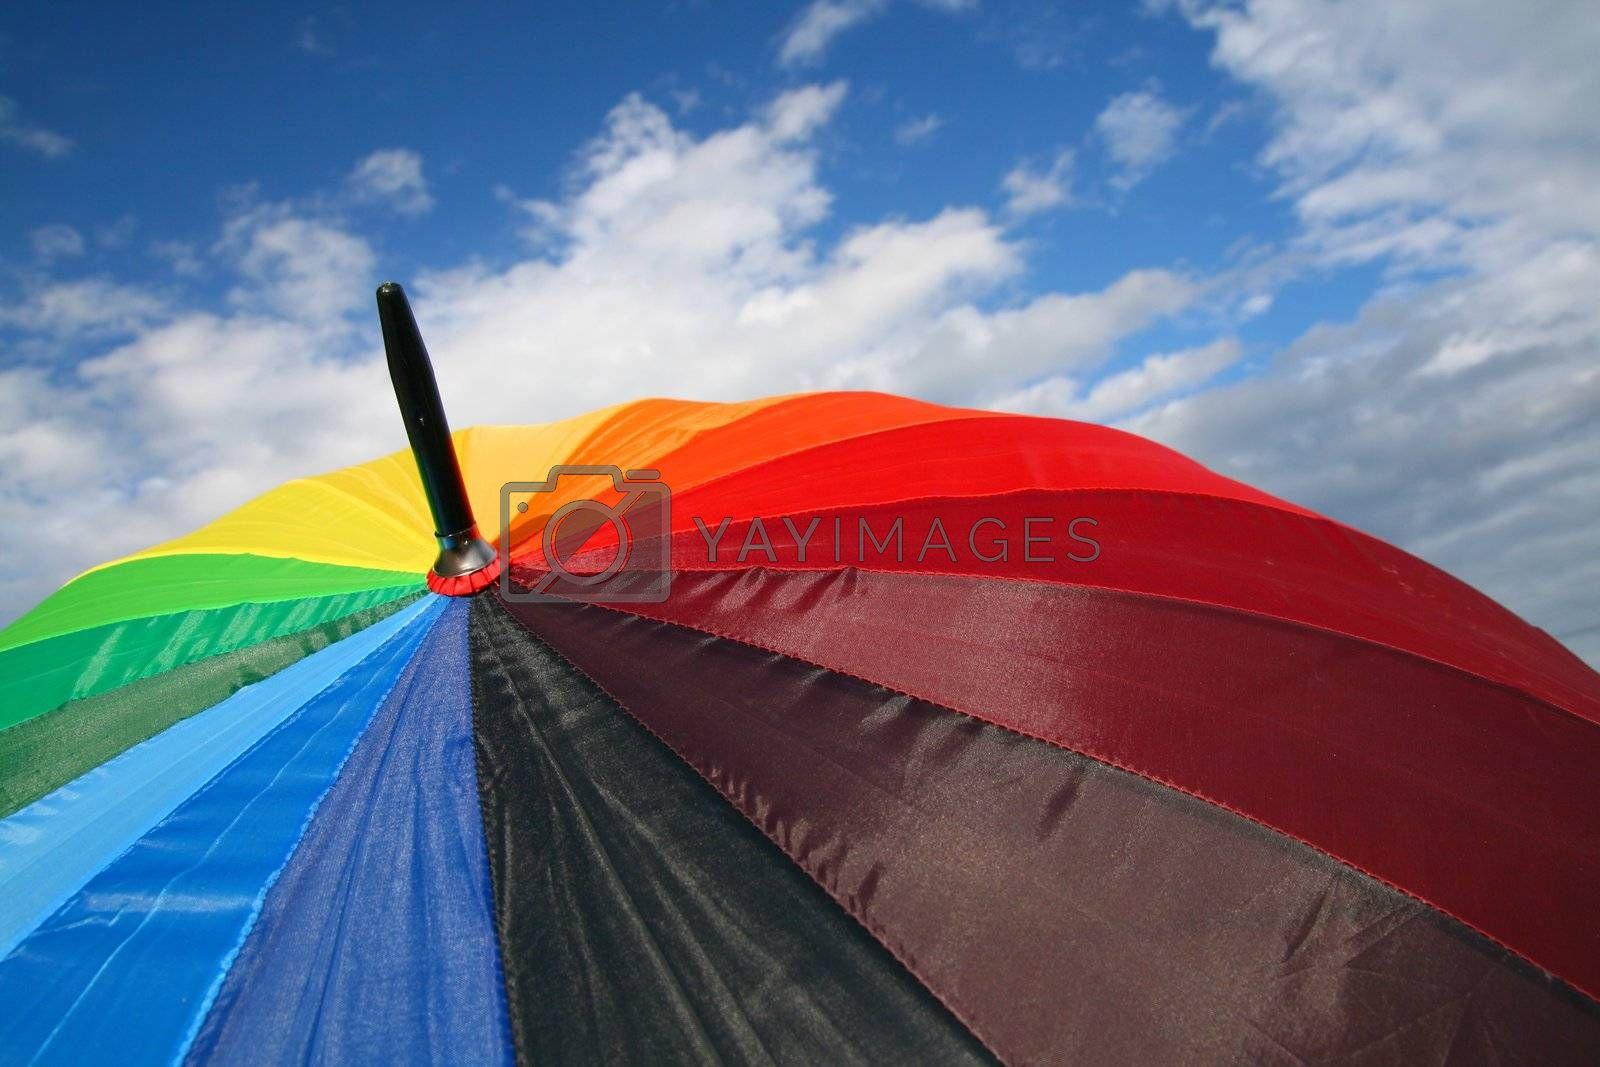 umbrella weather by Yellowj